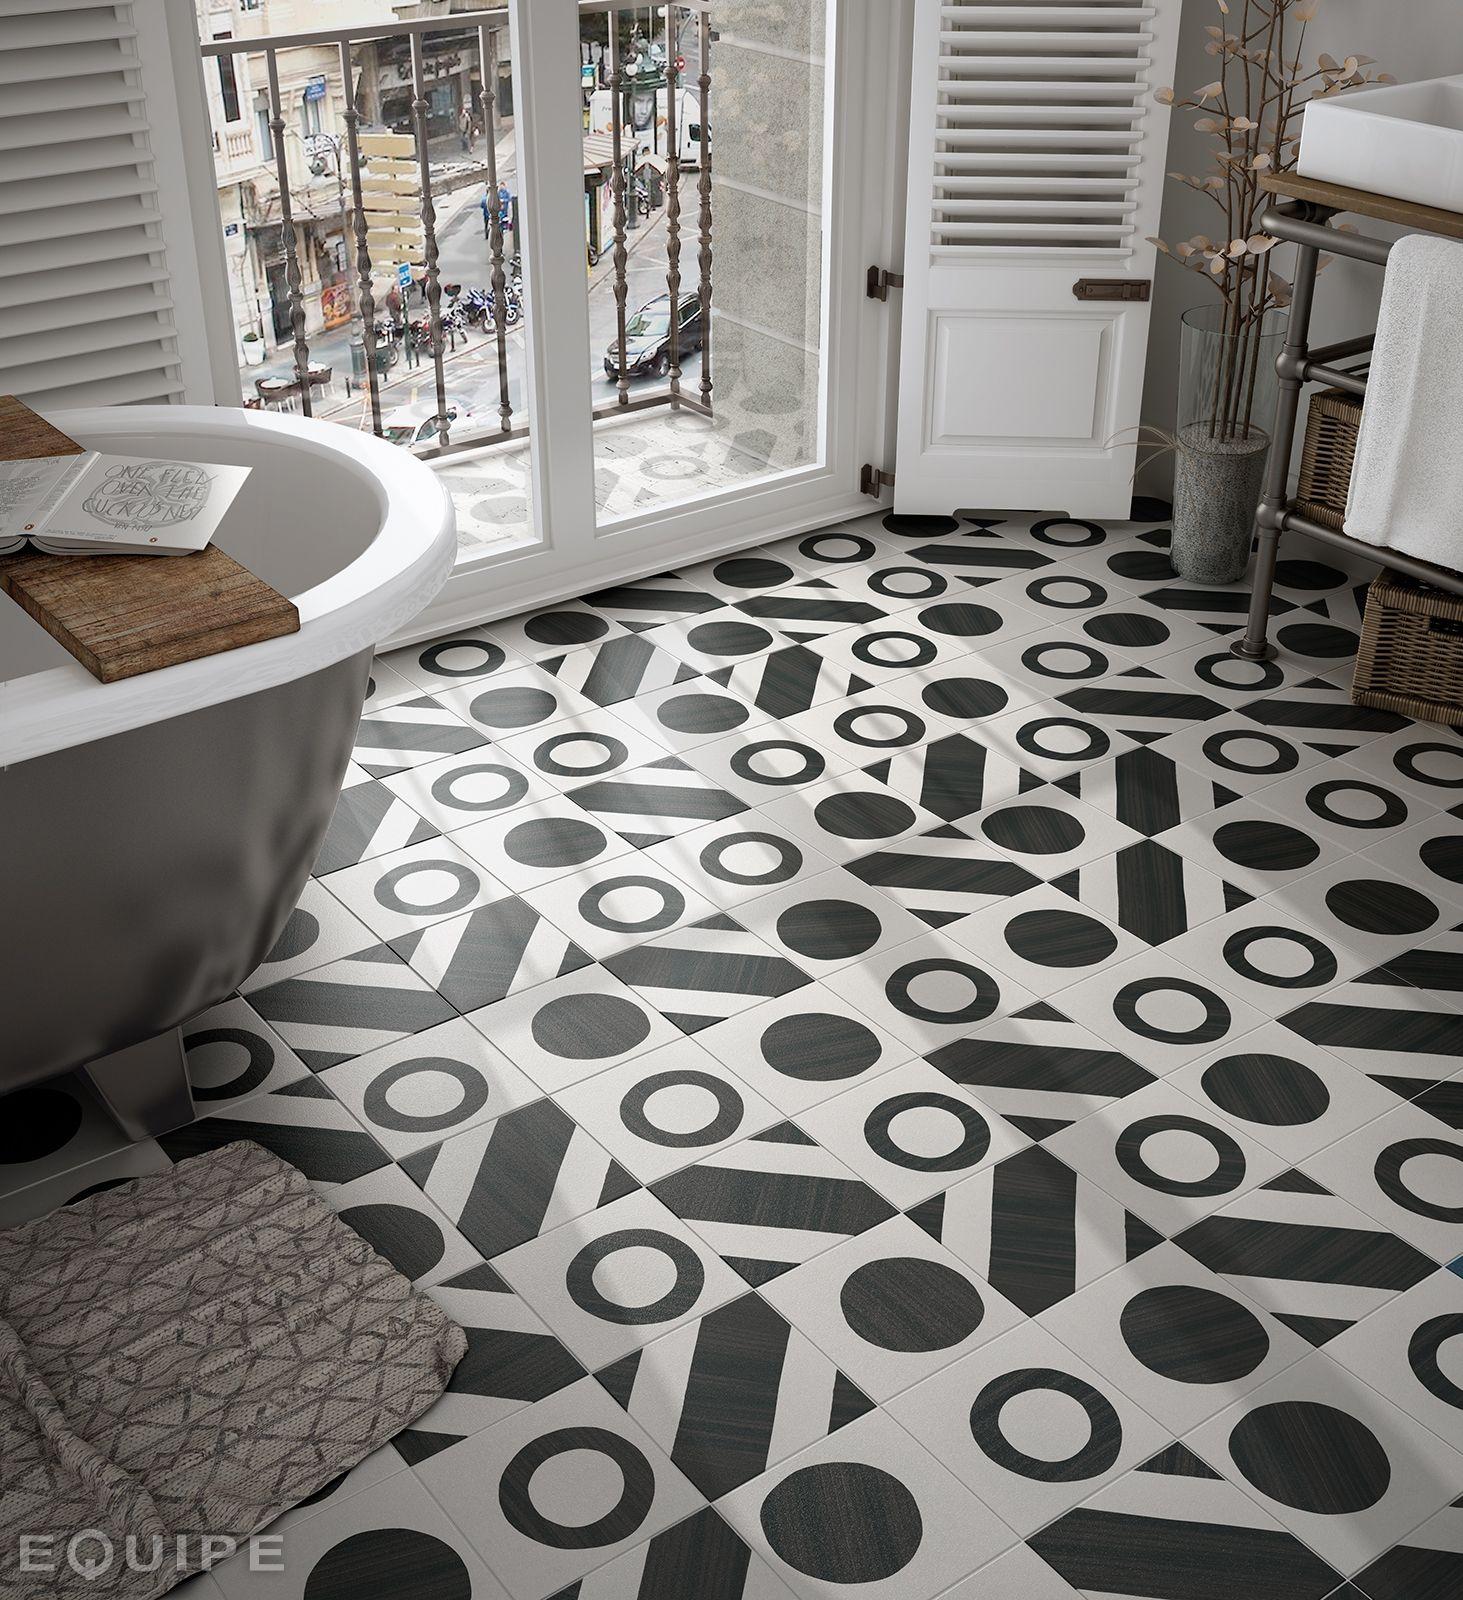 Home And Decor Tile Caprice Deco Balance B&w  Porcelanico  Pinterest  Flooring